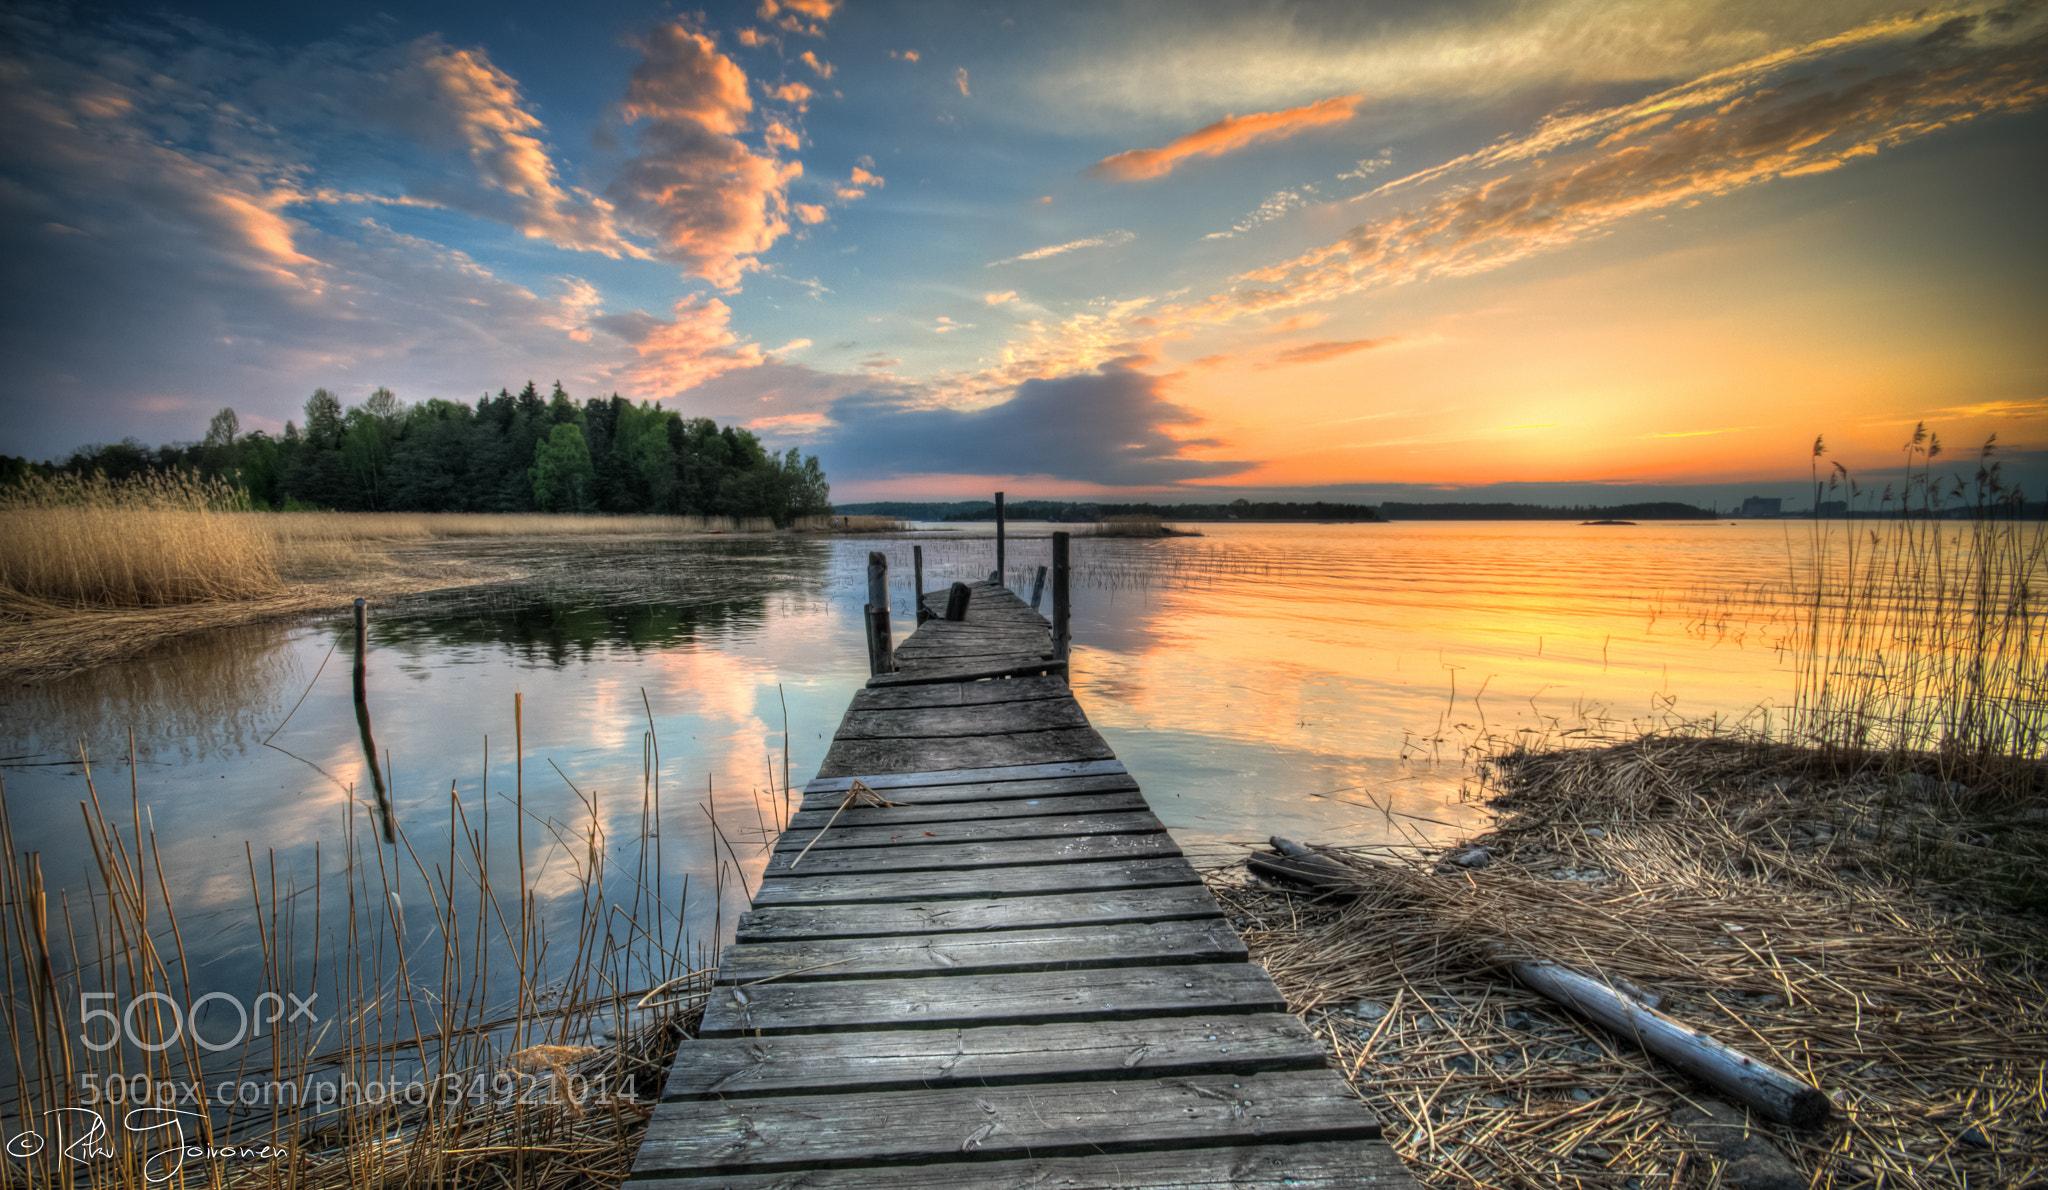 Photograph The Dock by Riku Toivonen on 500px